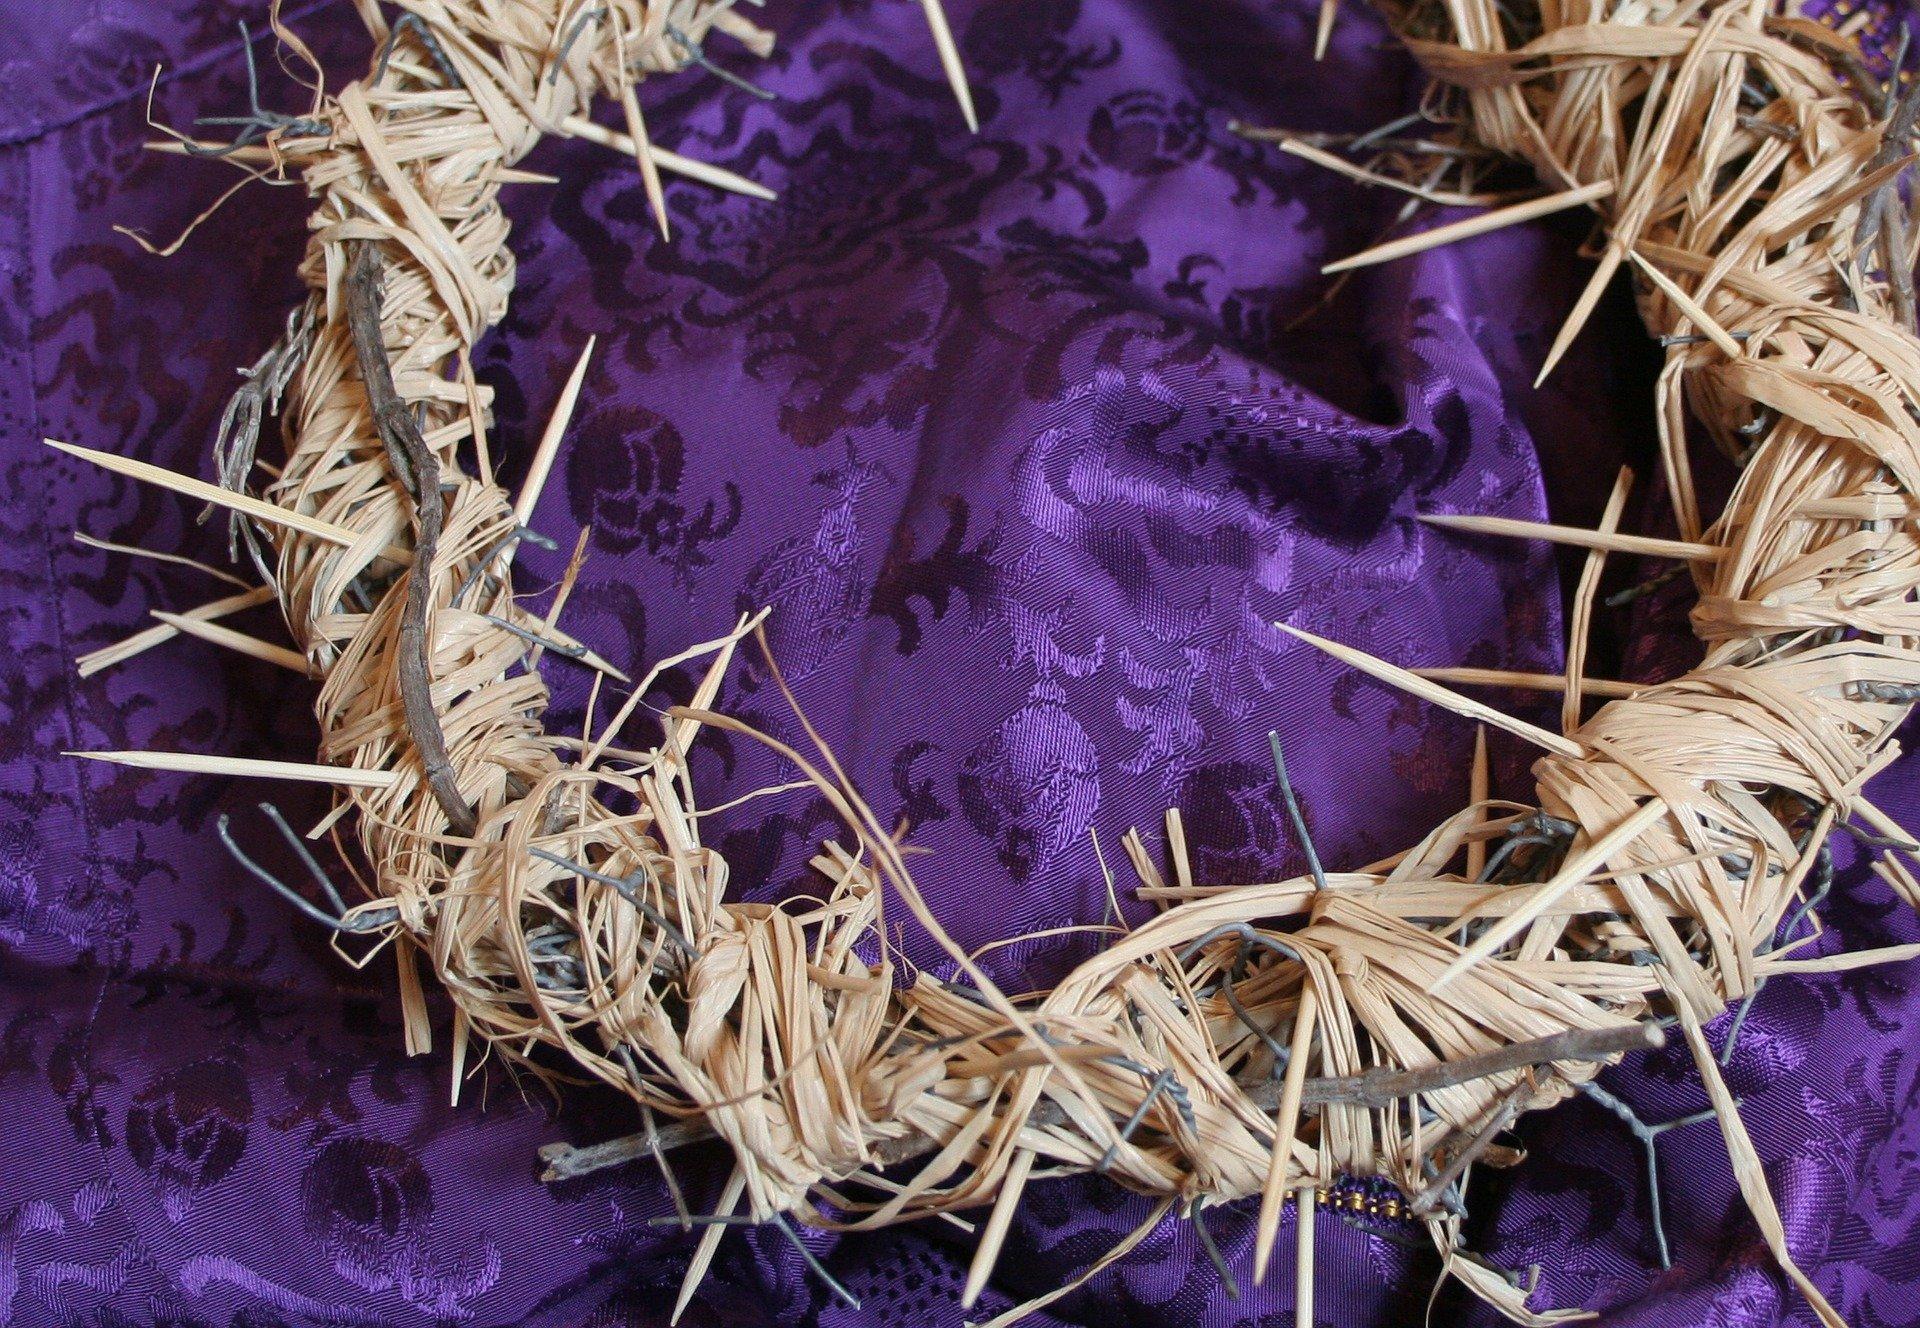 La semaine sainte au Saint-Esprit